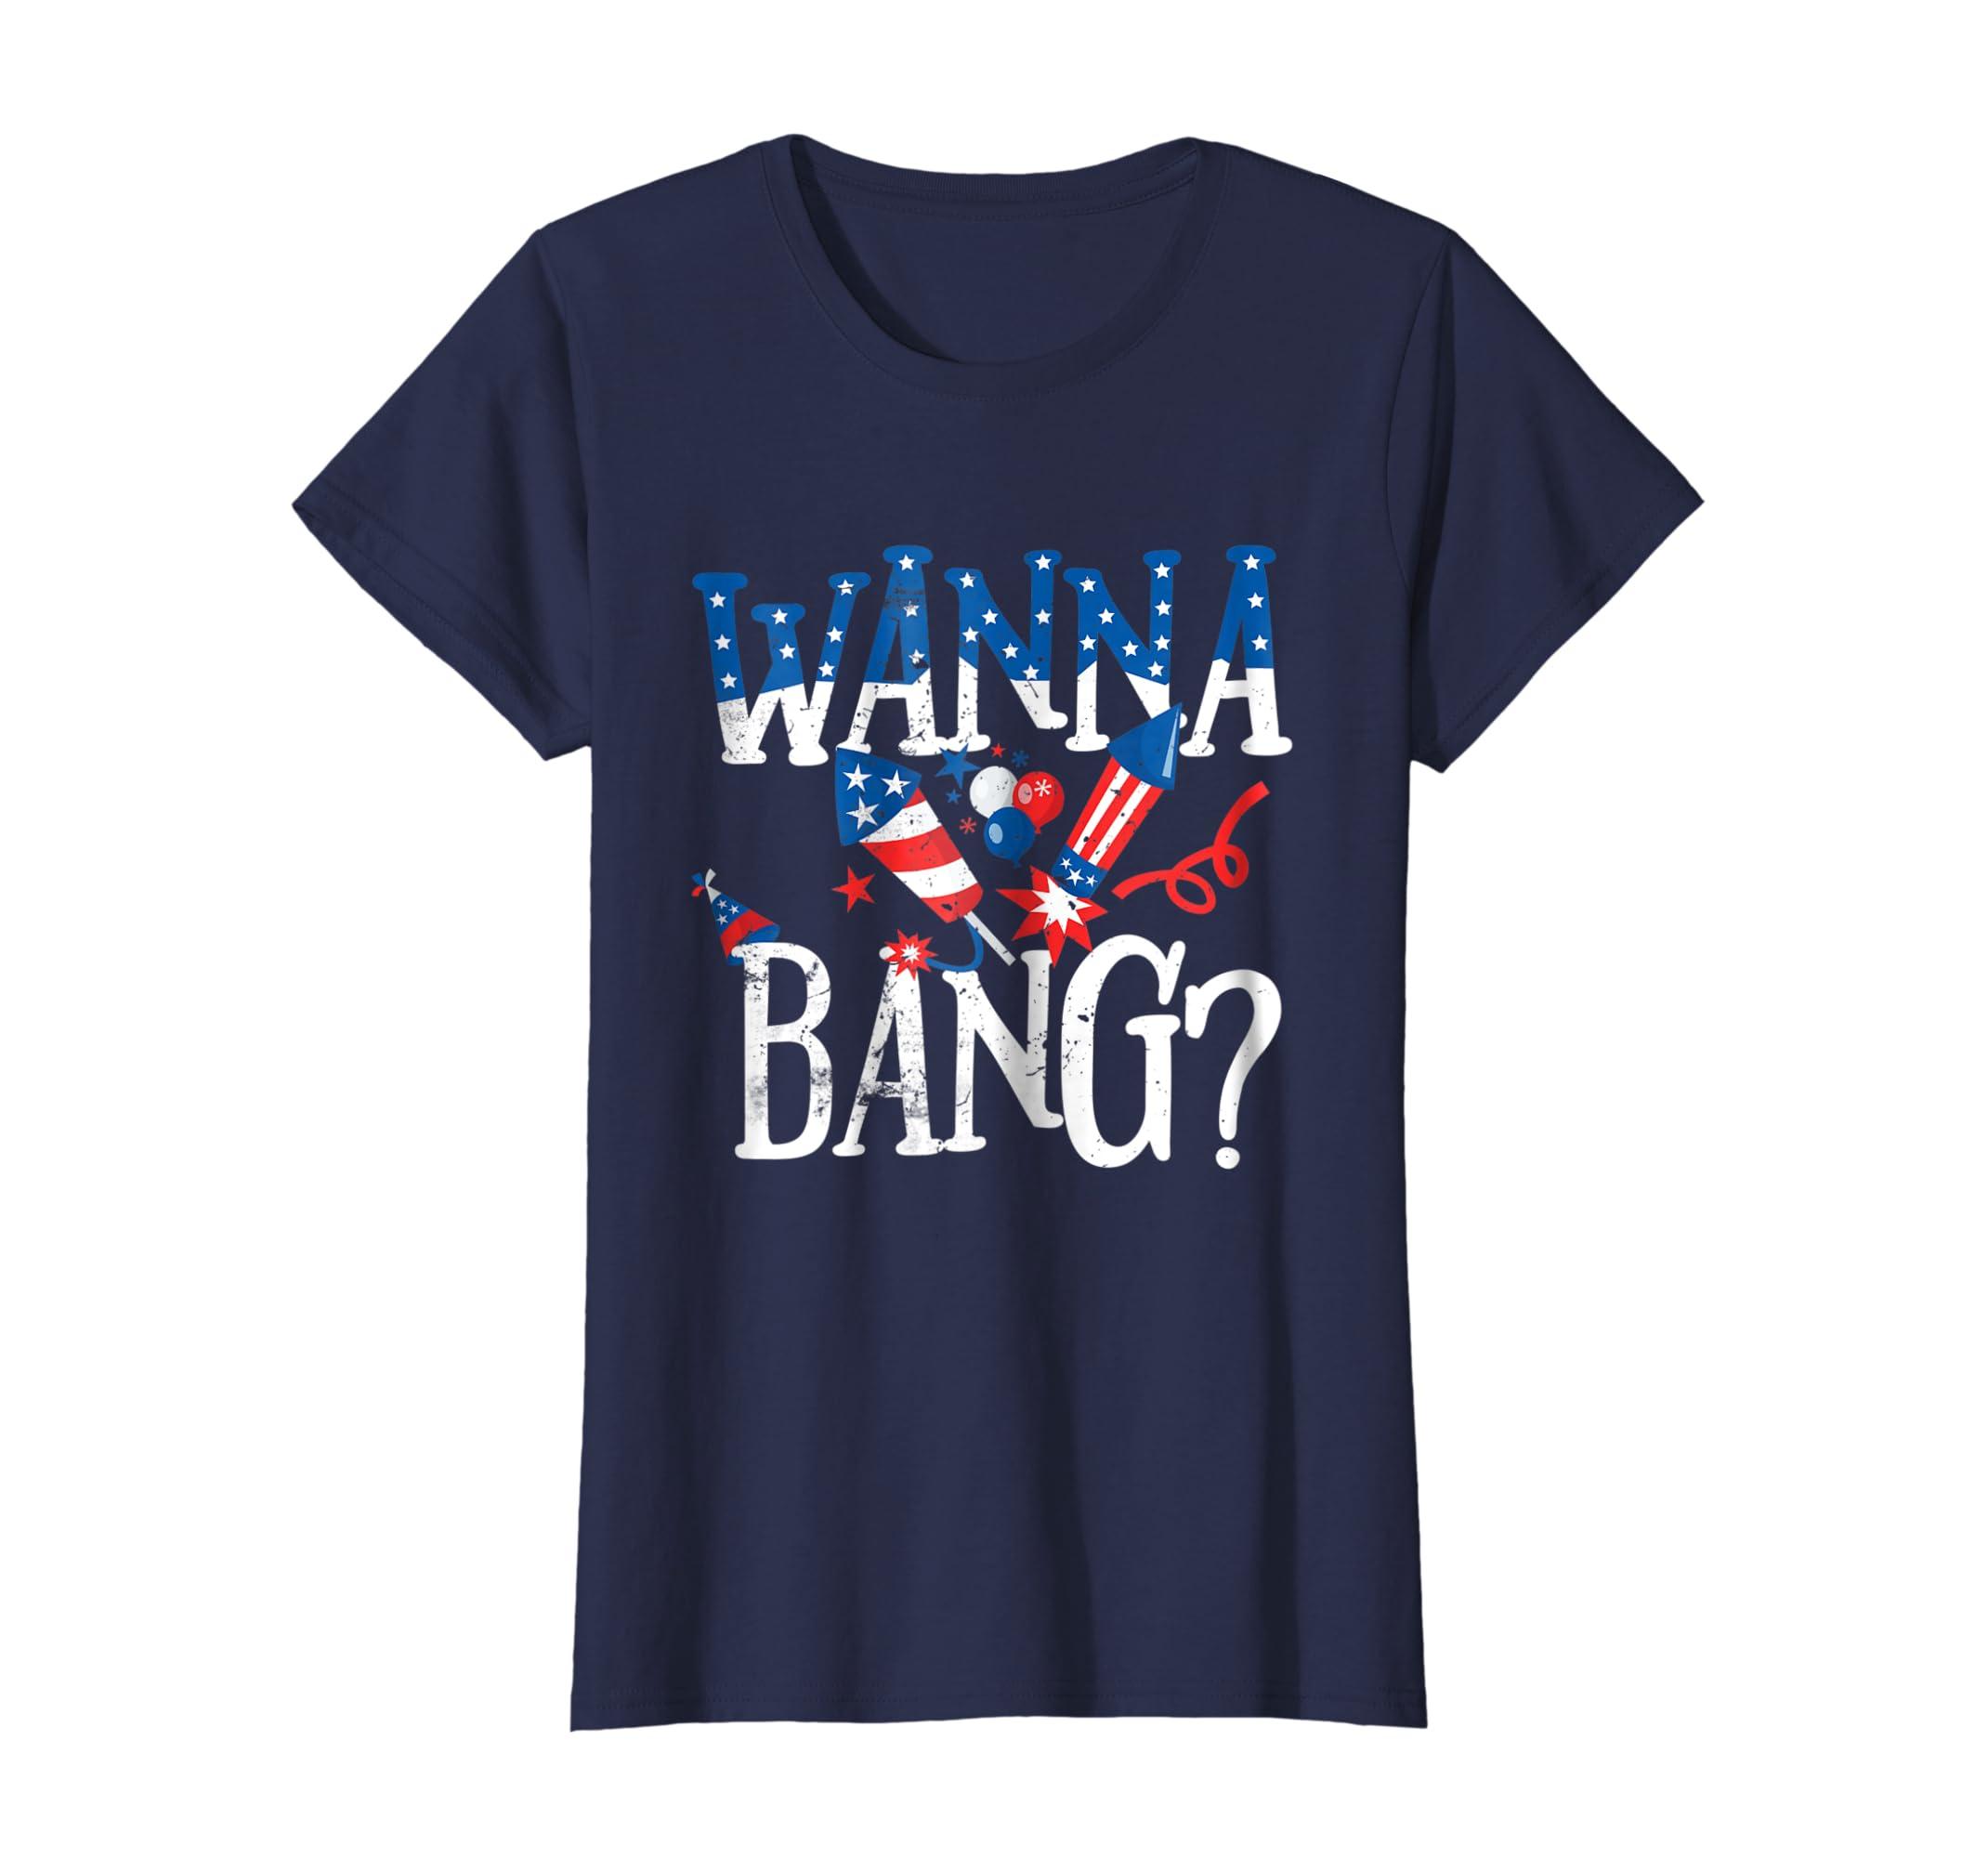 898dc91e0 Amazon.com: Wanna Bang Funny July 4th Gift T Shirt: Clothing